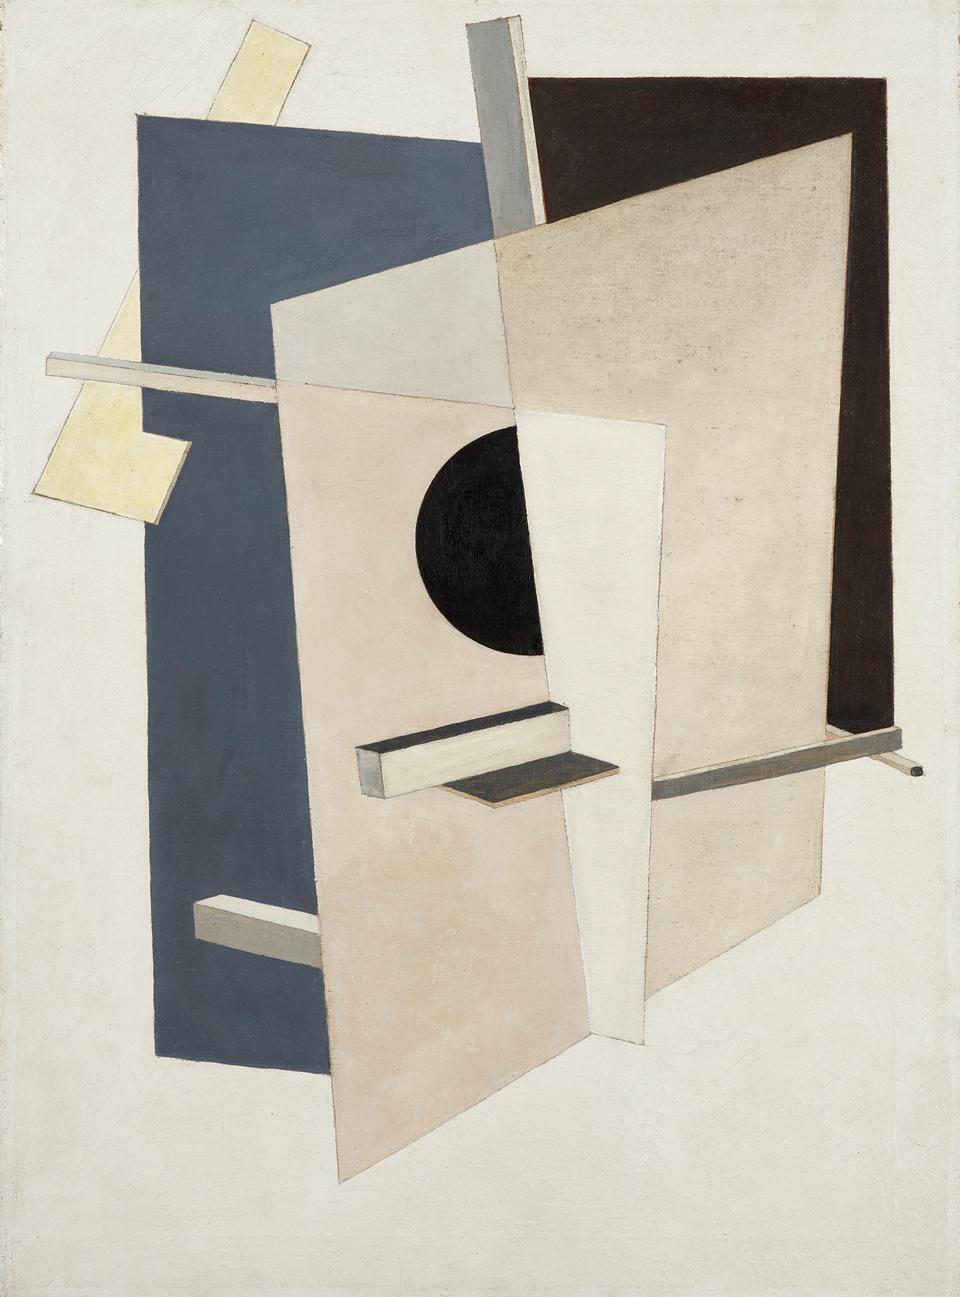 El Lissitzky: Proun 6, um 1919-1920, Öl auf Leinwand, 81 x 59 cm, Kulturstiftung Sachsen-Anhalt, Kunstmuseum Moritzburg Halle (Saale), Foto: Punctum/Bertram Kober